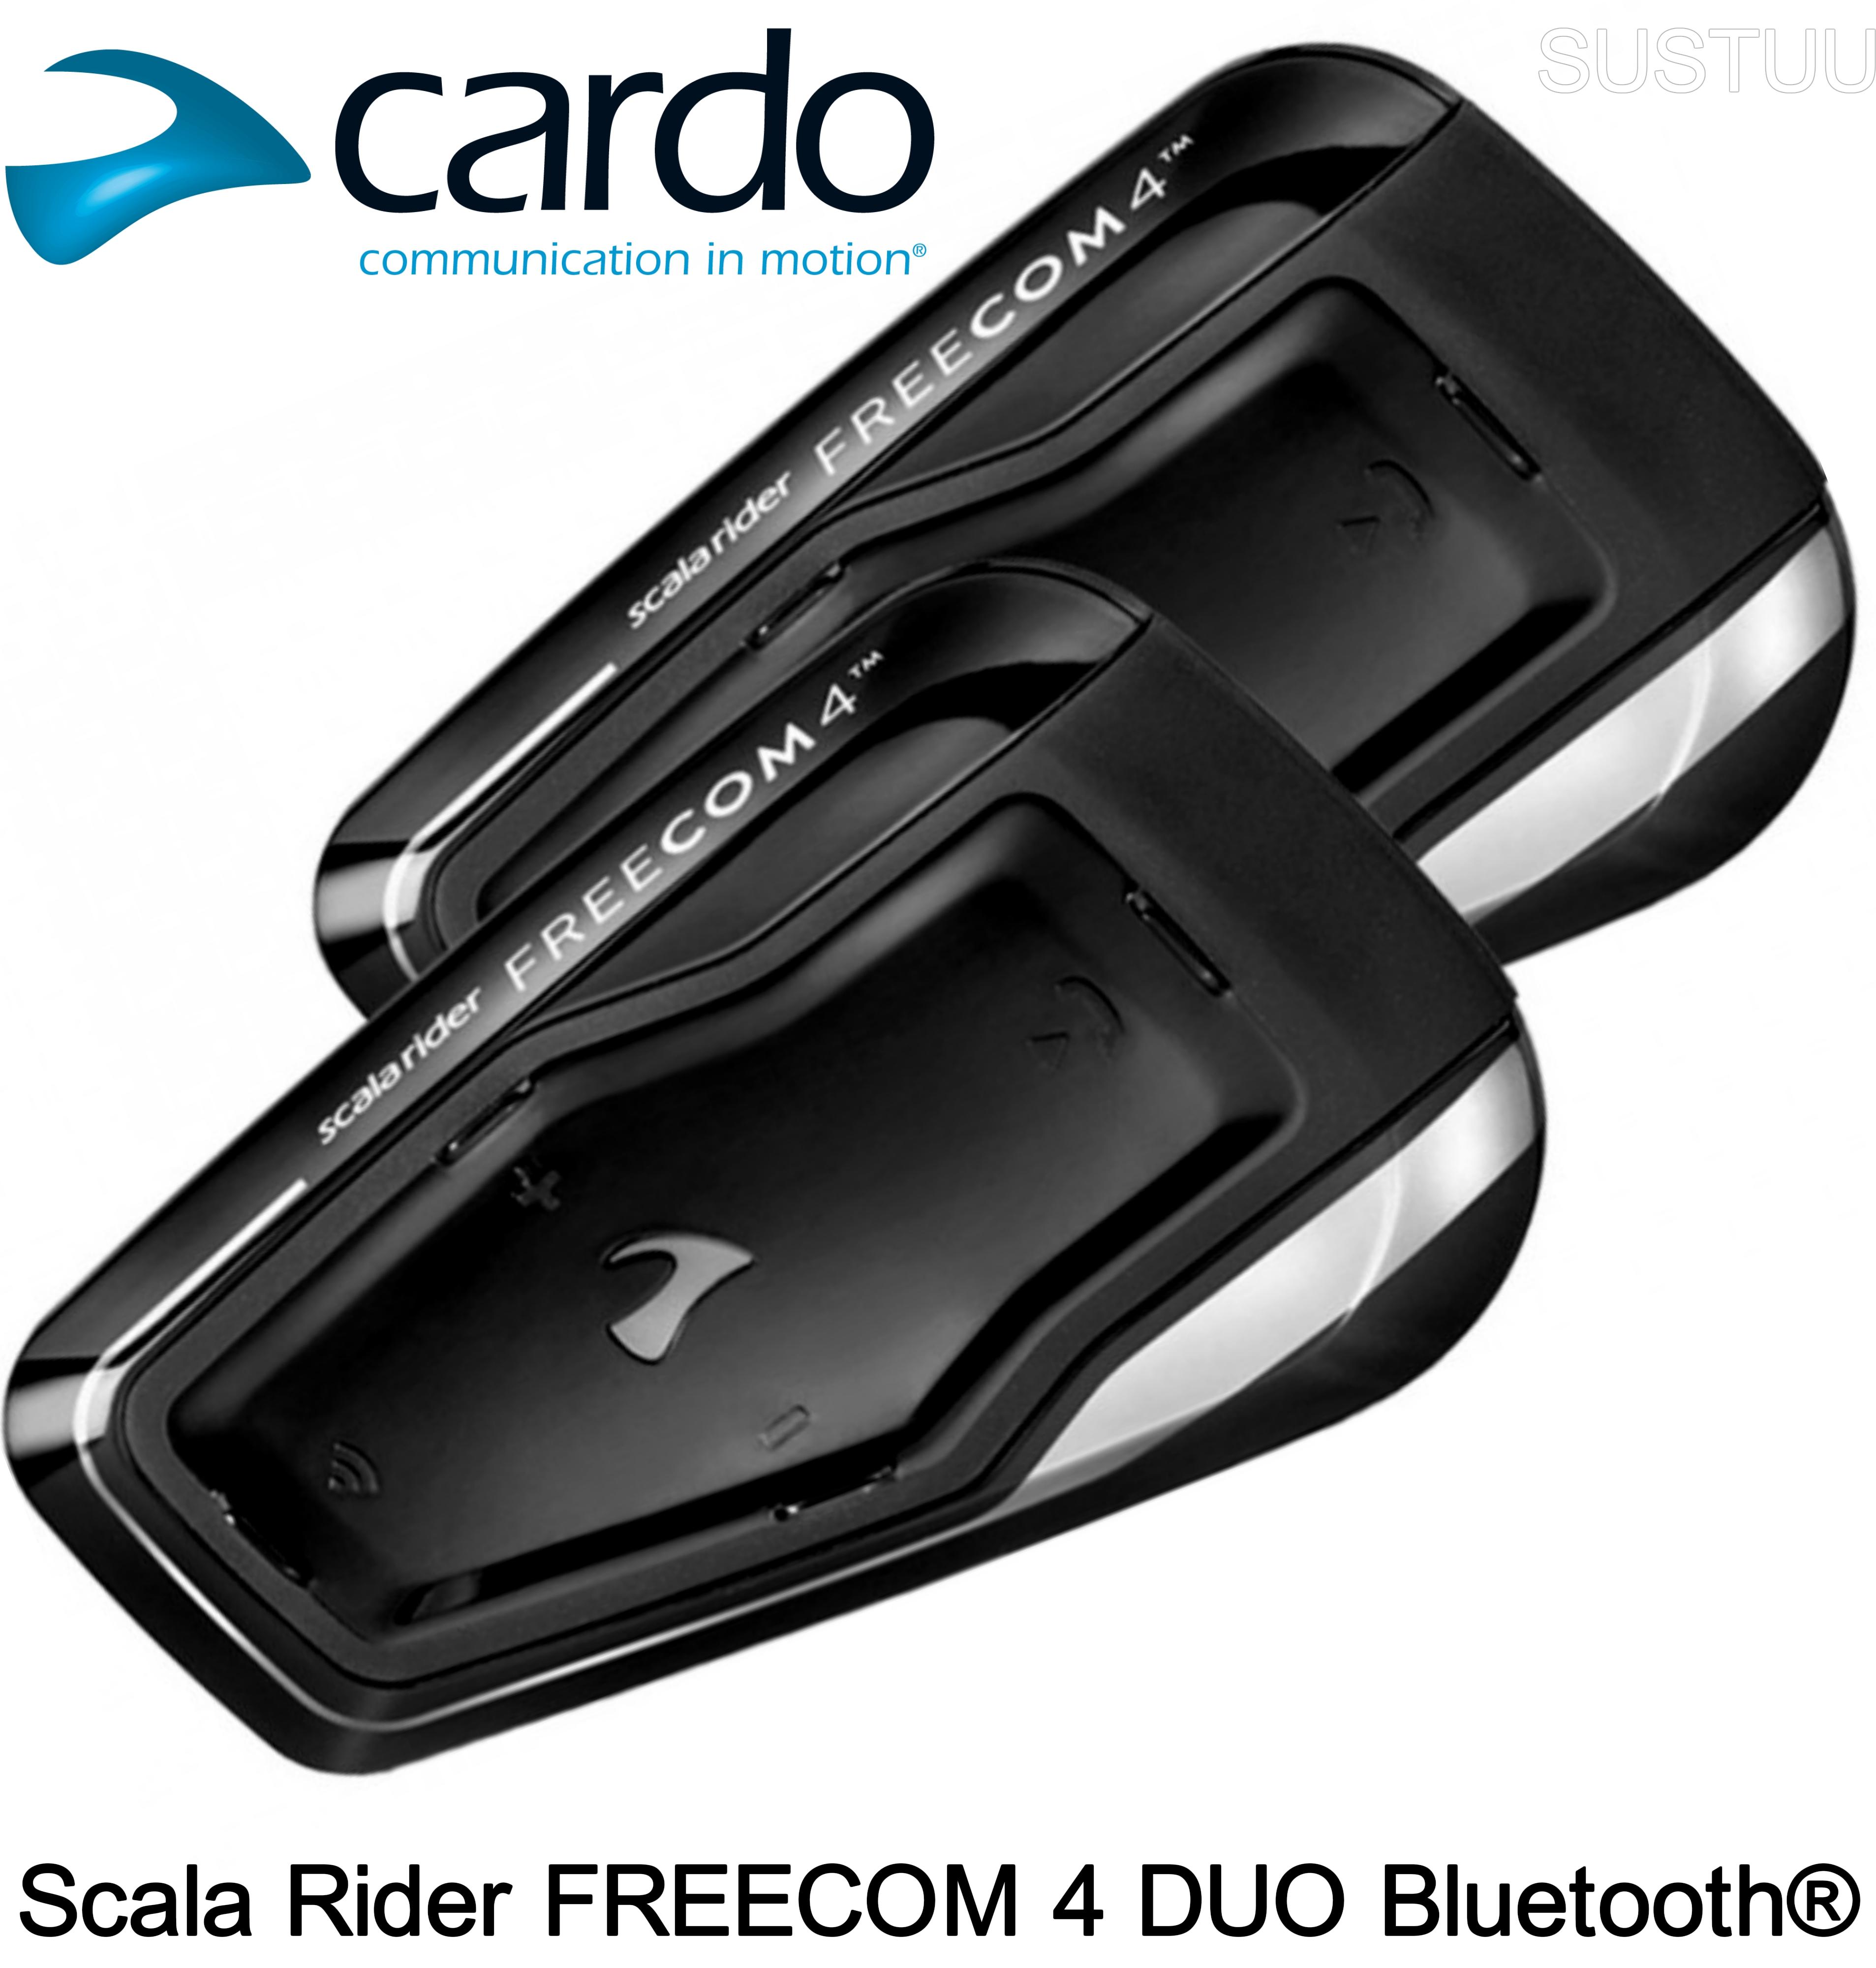 cardo scala rider freecom 4 duo motorcycle intercom bluetooth headset 4 1 set 2. Black Bedroom Furniture Sets. Home Design Ideas